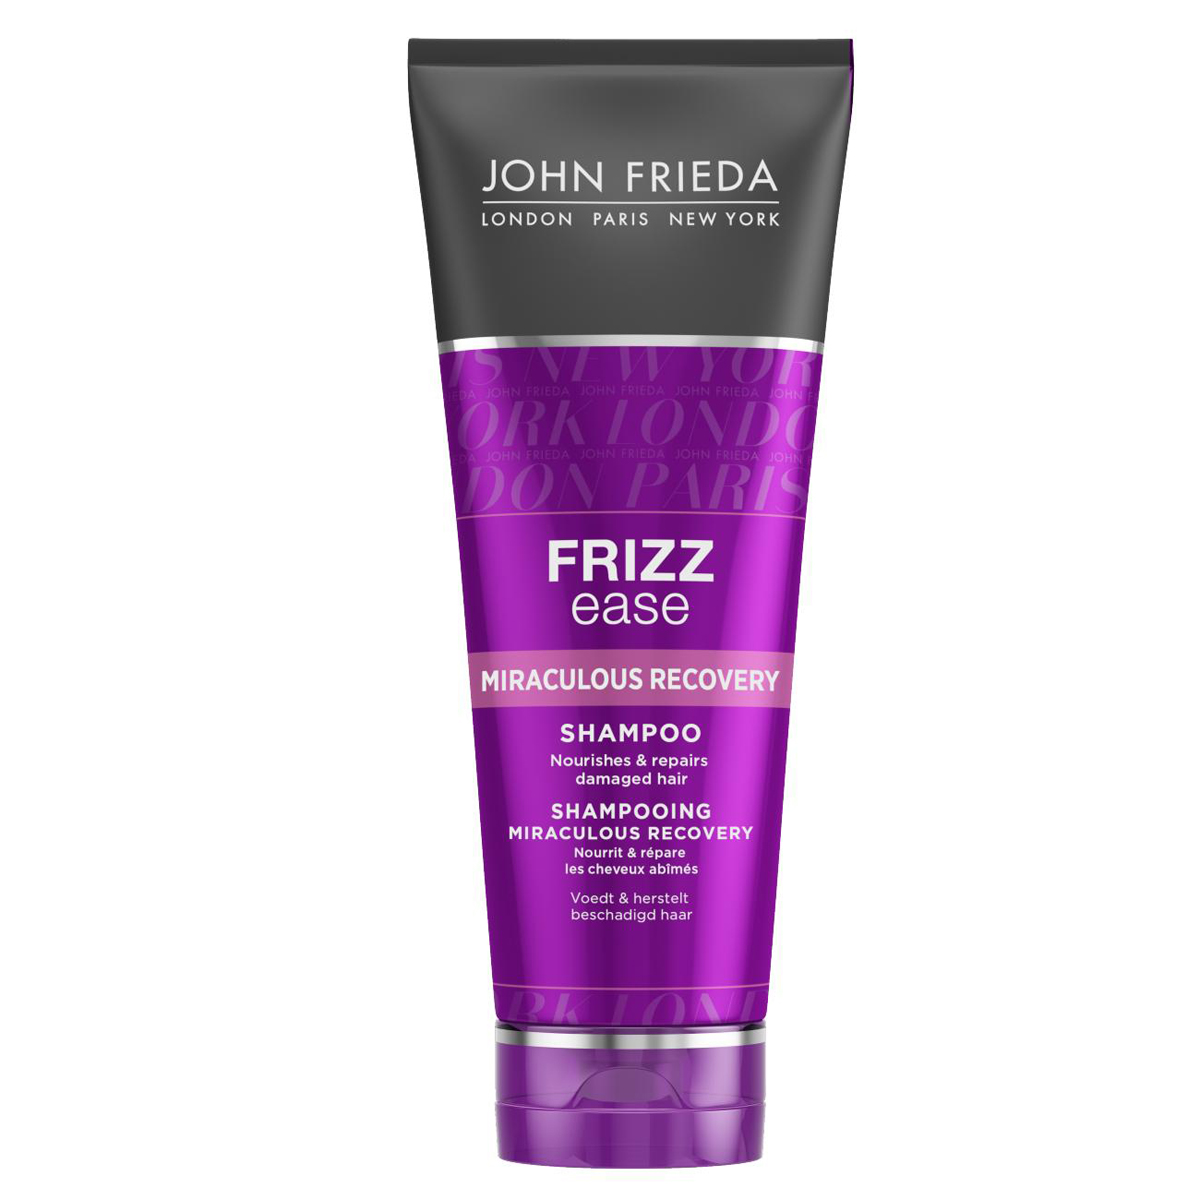 John Frieda Шампунь для укрепления волос Miraculous recovery, 250 мл john frieda miraculous recovery deep conditioner